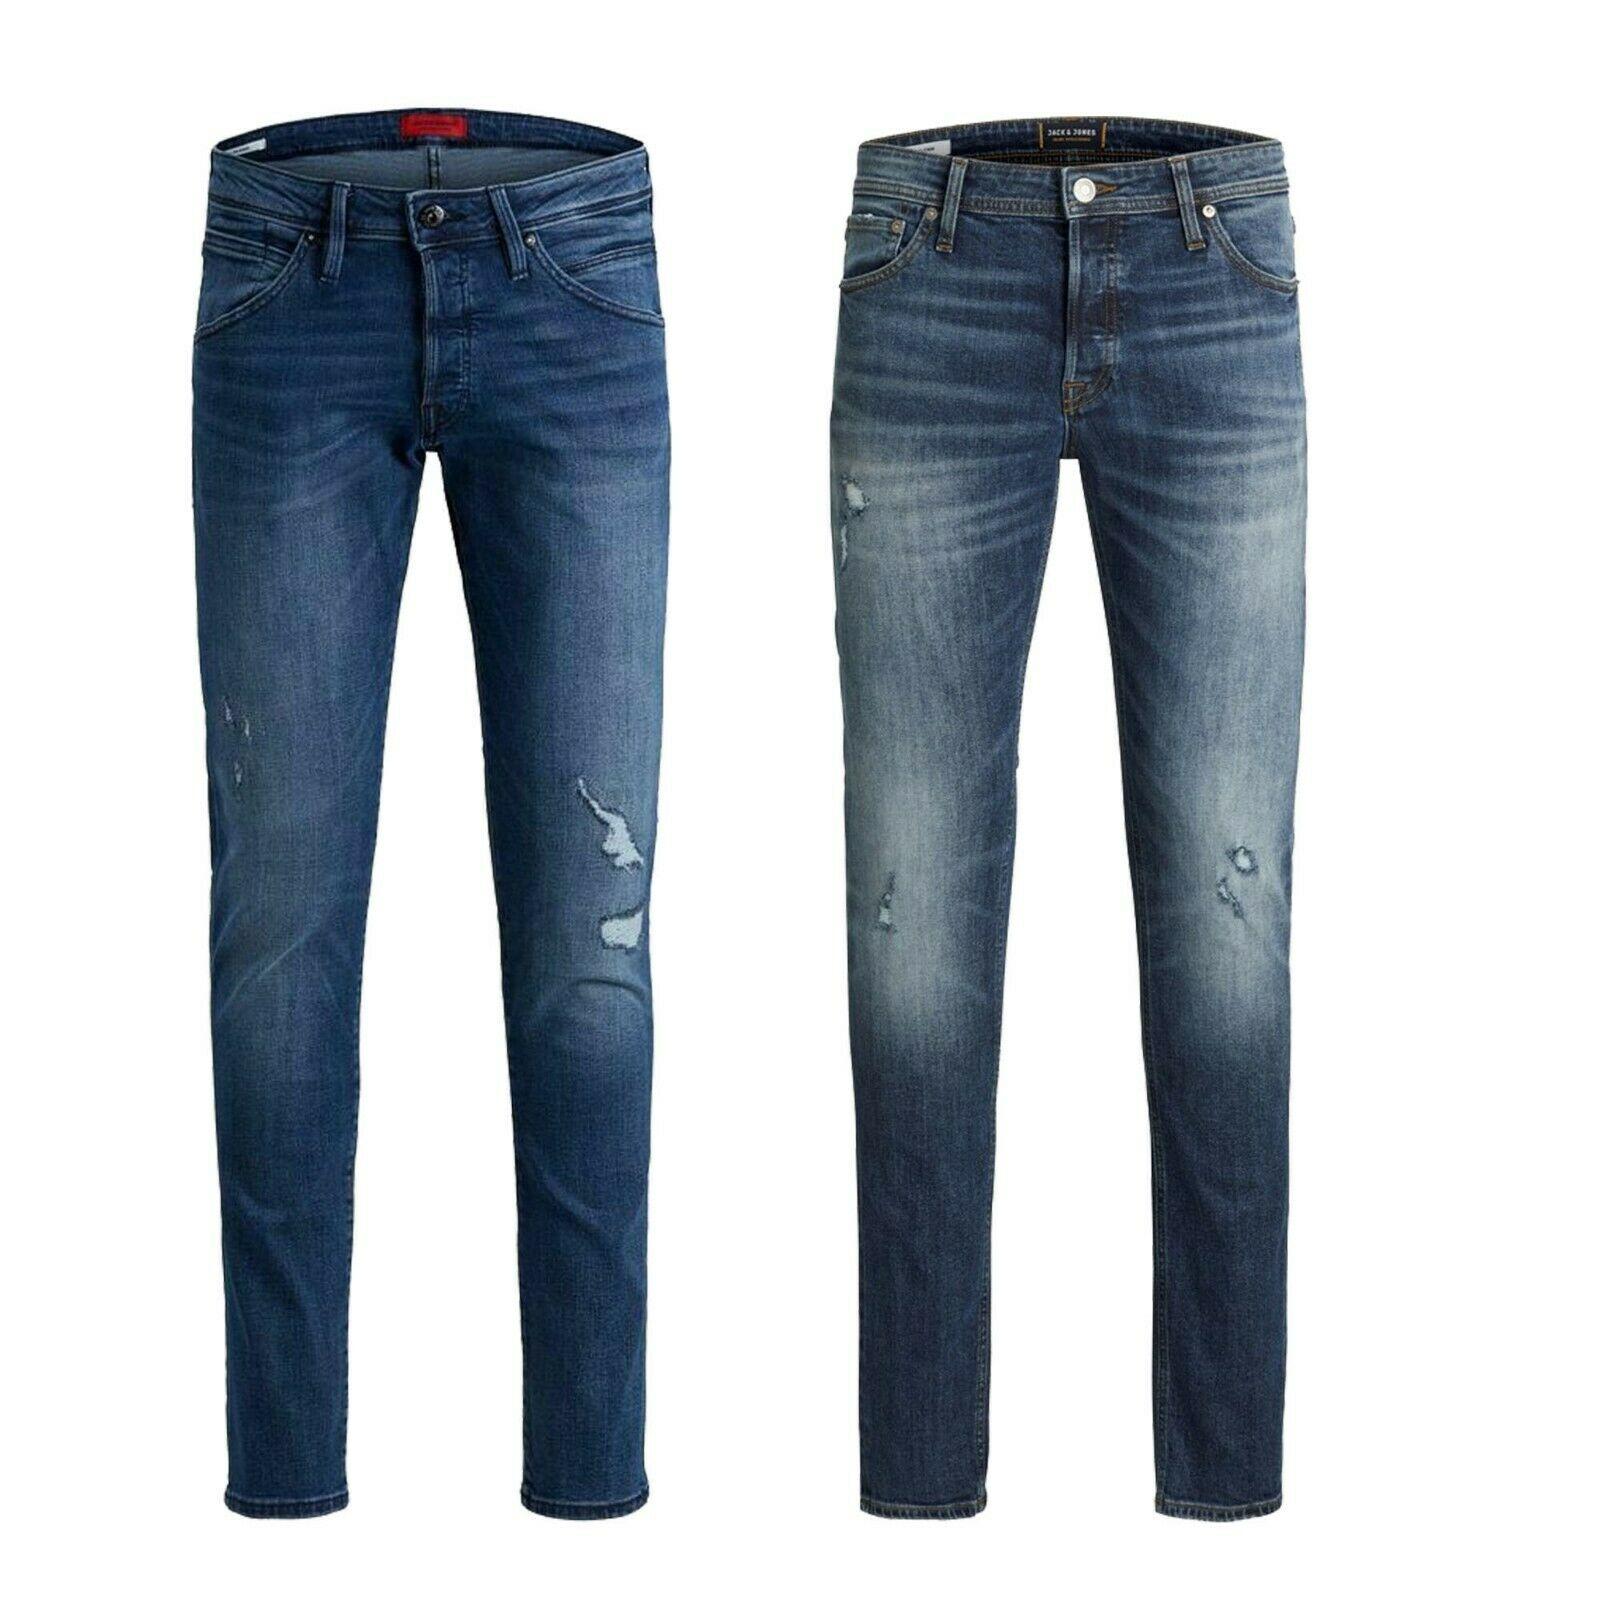 Jack /& Jones Tim Mens Blue Denim Slim Fit Jeans Regular Length Pants Waist 28-36